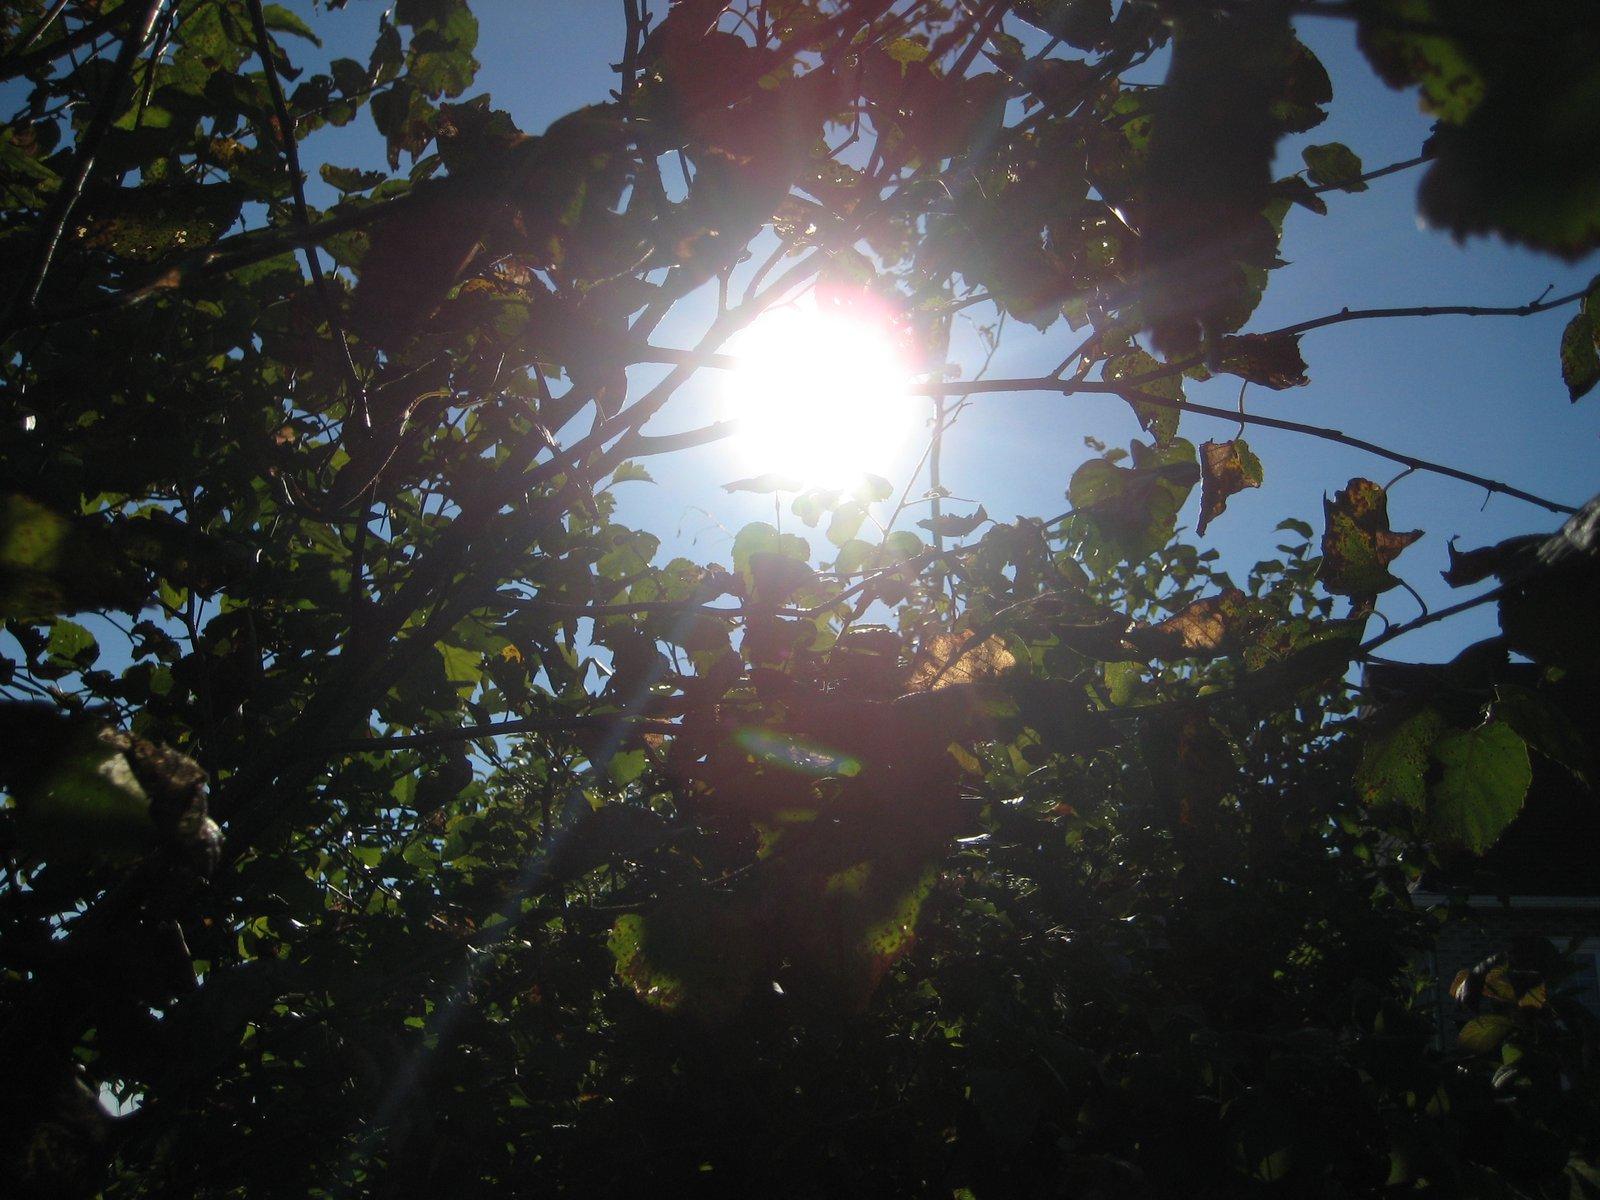 Sun in the leaf